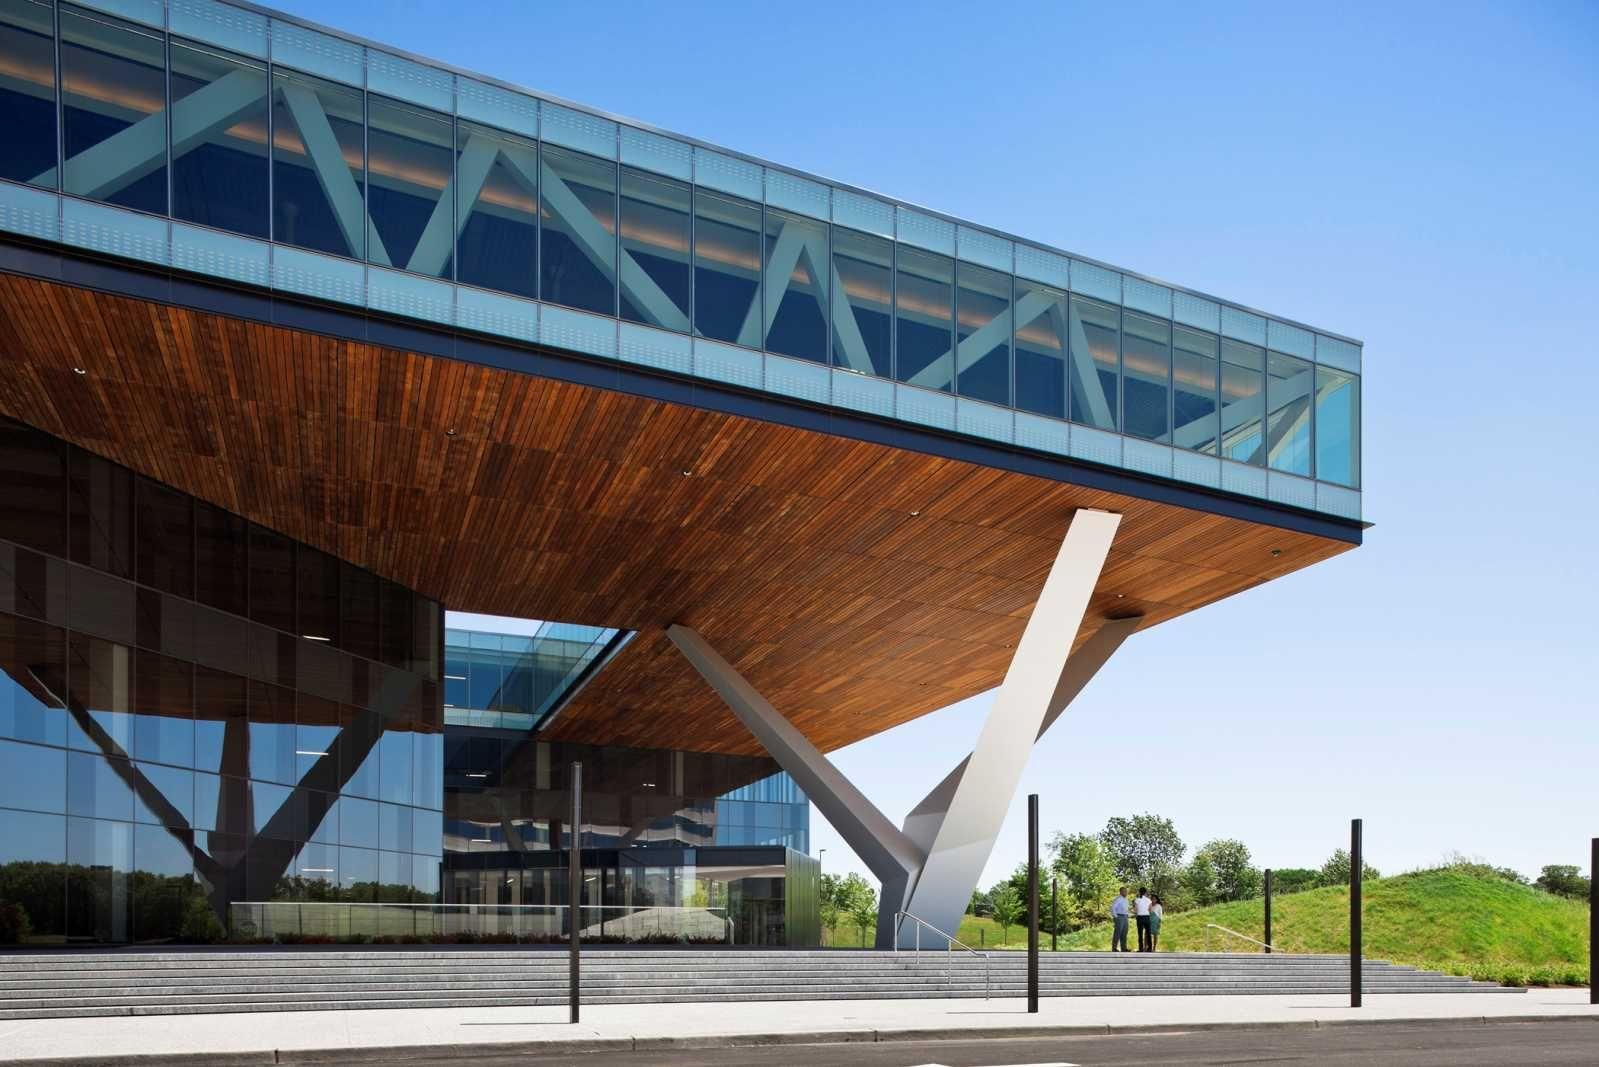 Best Glass Steel Truss Floor Google Search Architecture 400 x 300